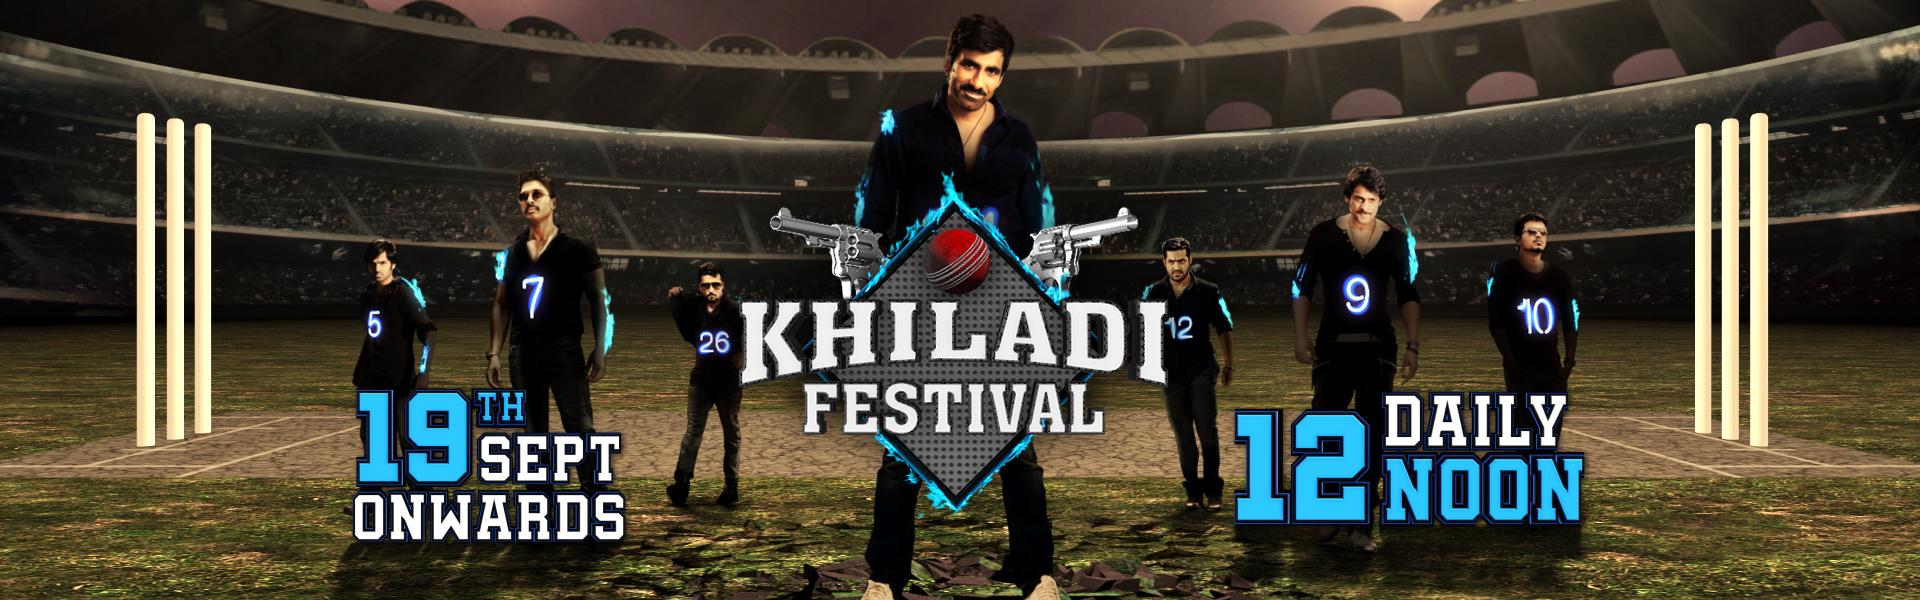 Khiladi Festival